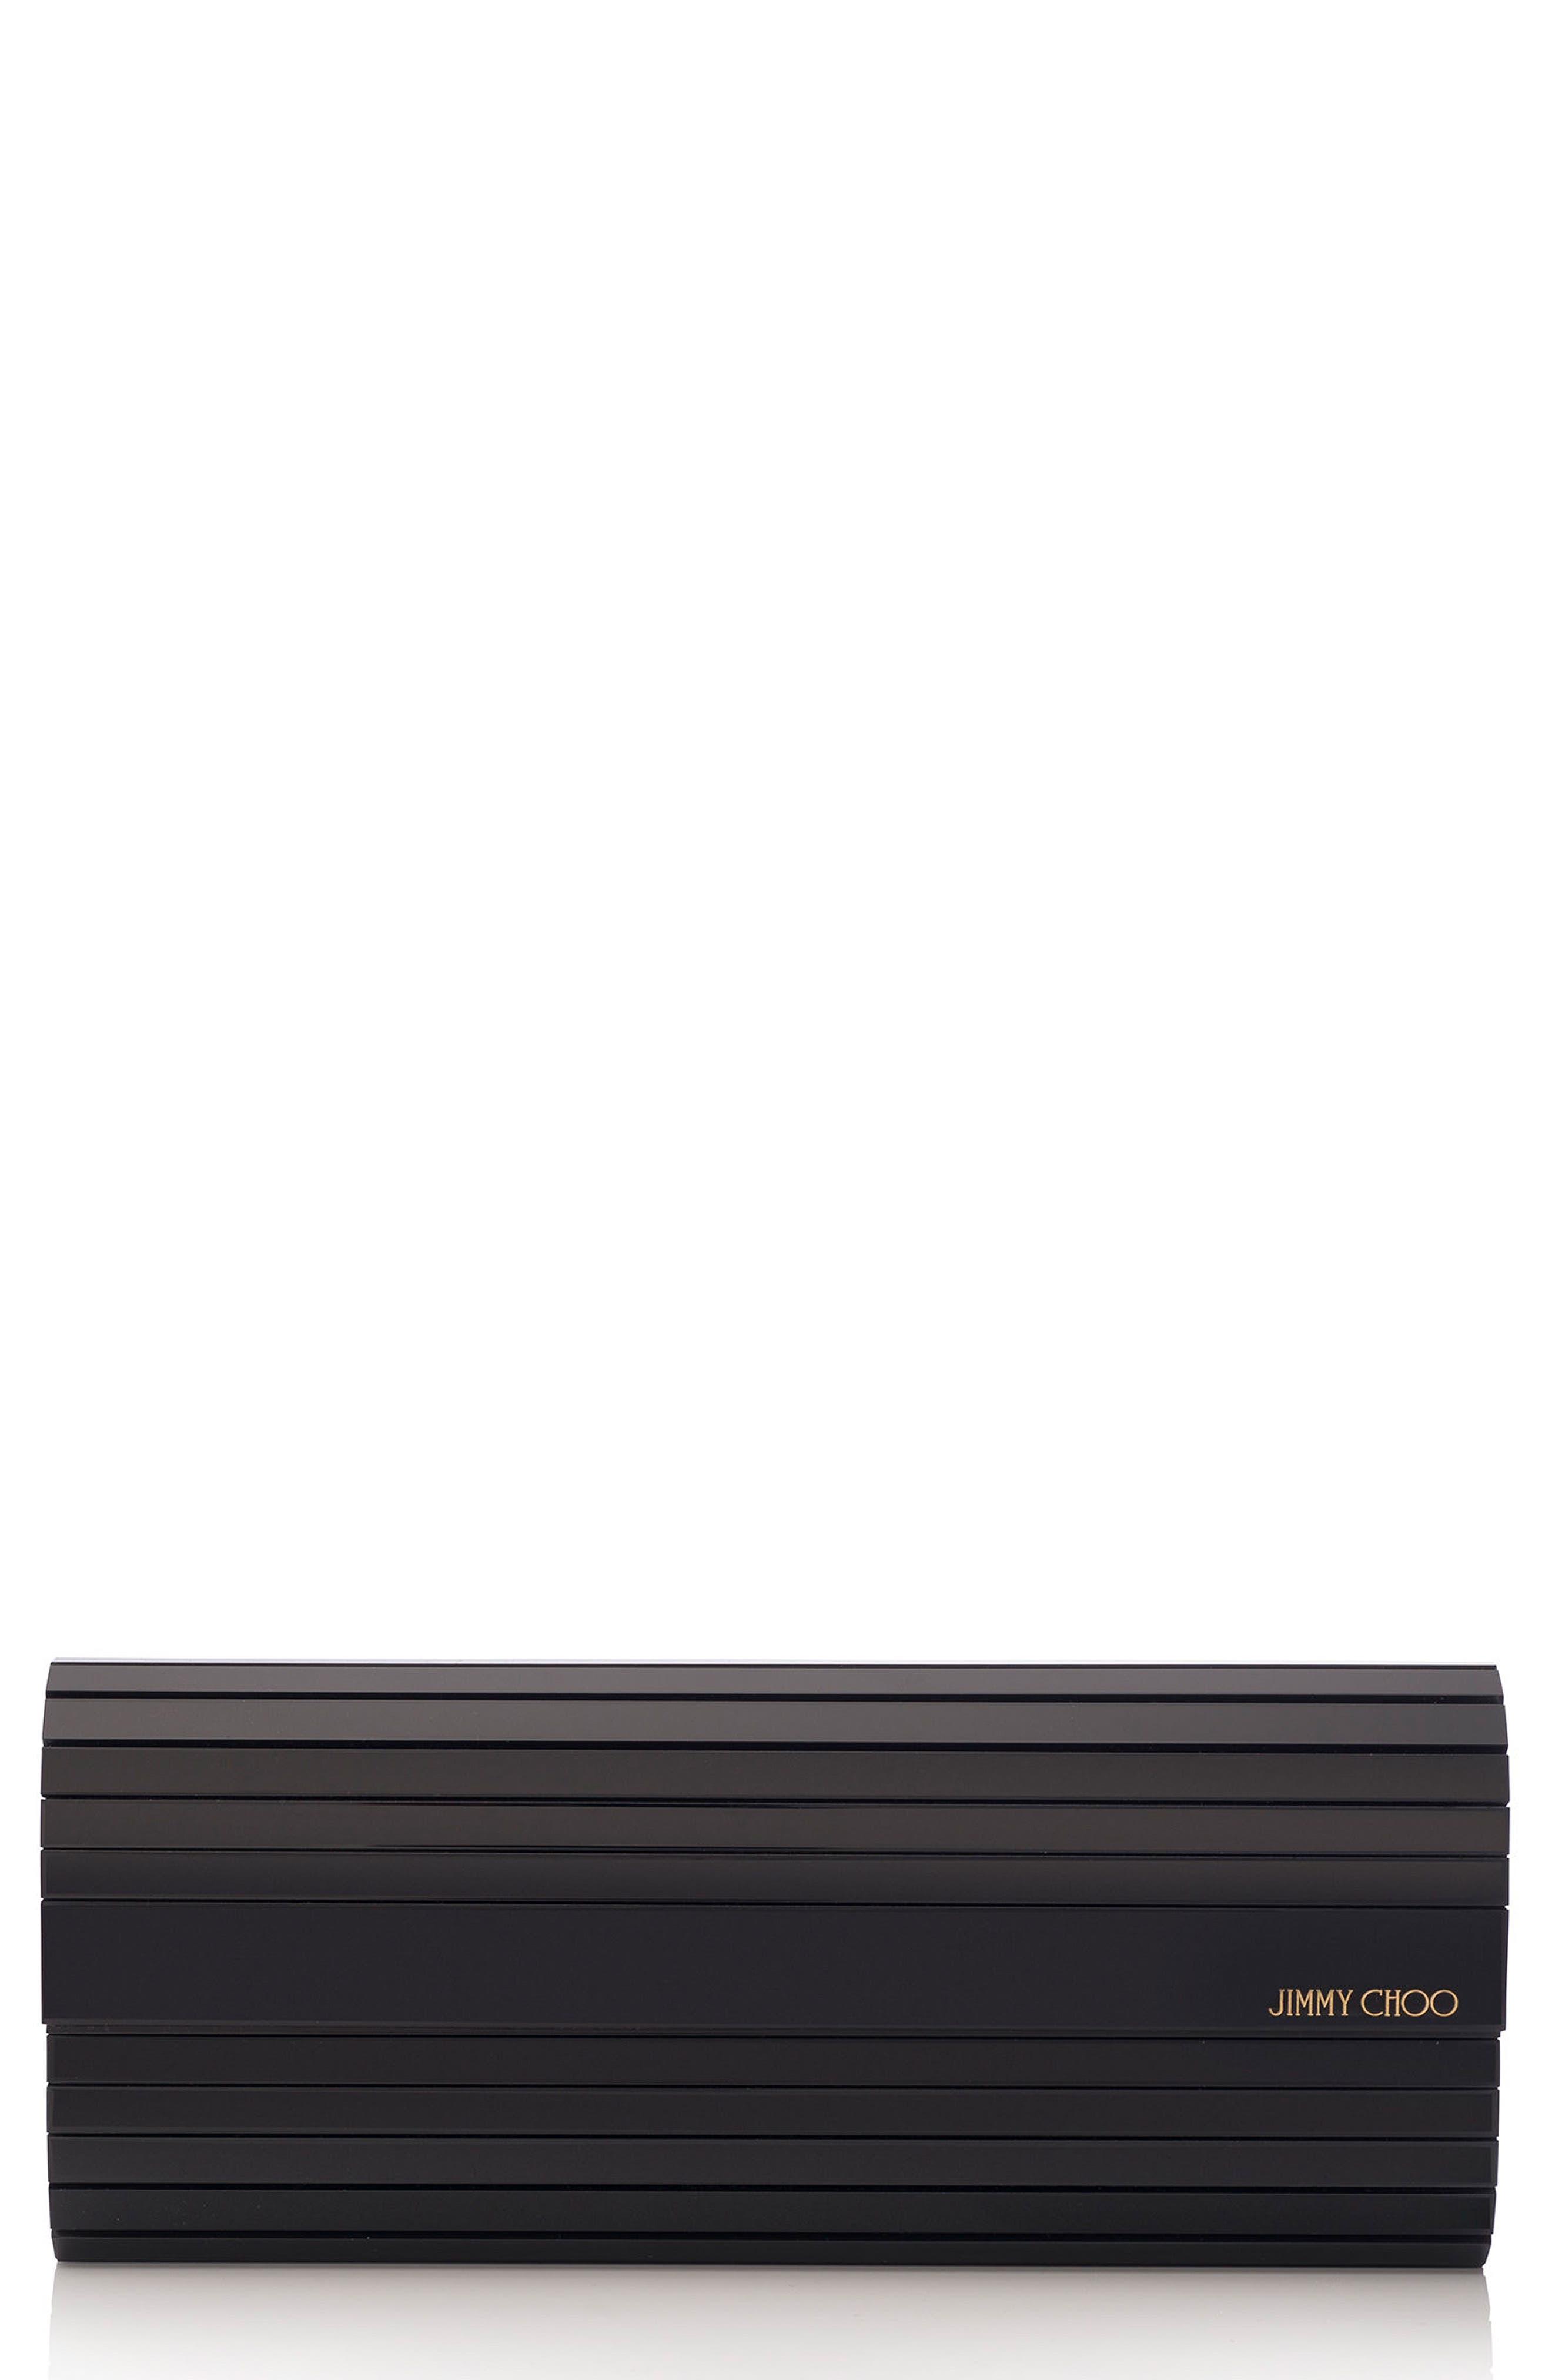 Sweetie Acrylic Clutch,                         Main,                         color, BLACK